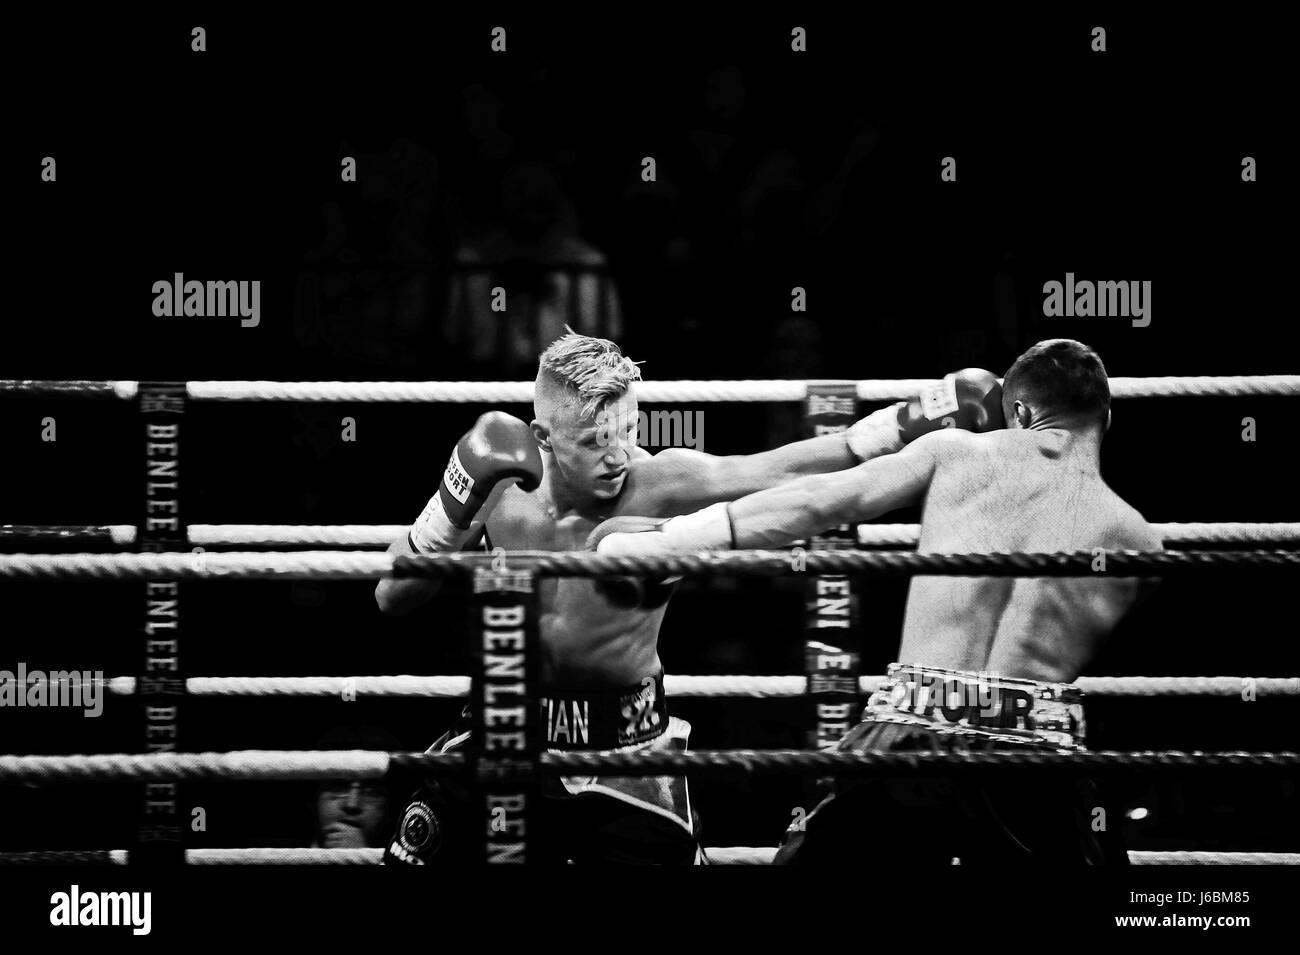 Sebastian Formella (Left, Hamburg, GER) vs. Denis Krieger (Right, Hamburg, GER), Superwelterweight, IBO Continentle - Stock-Bilder